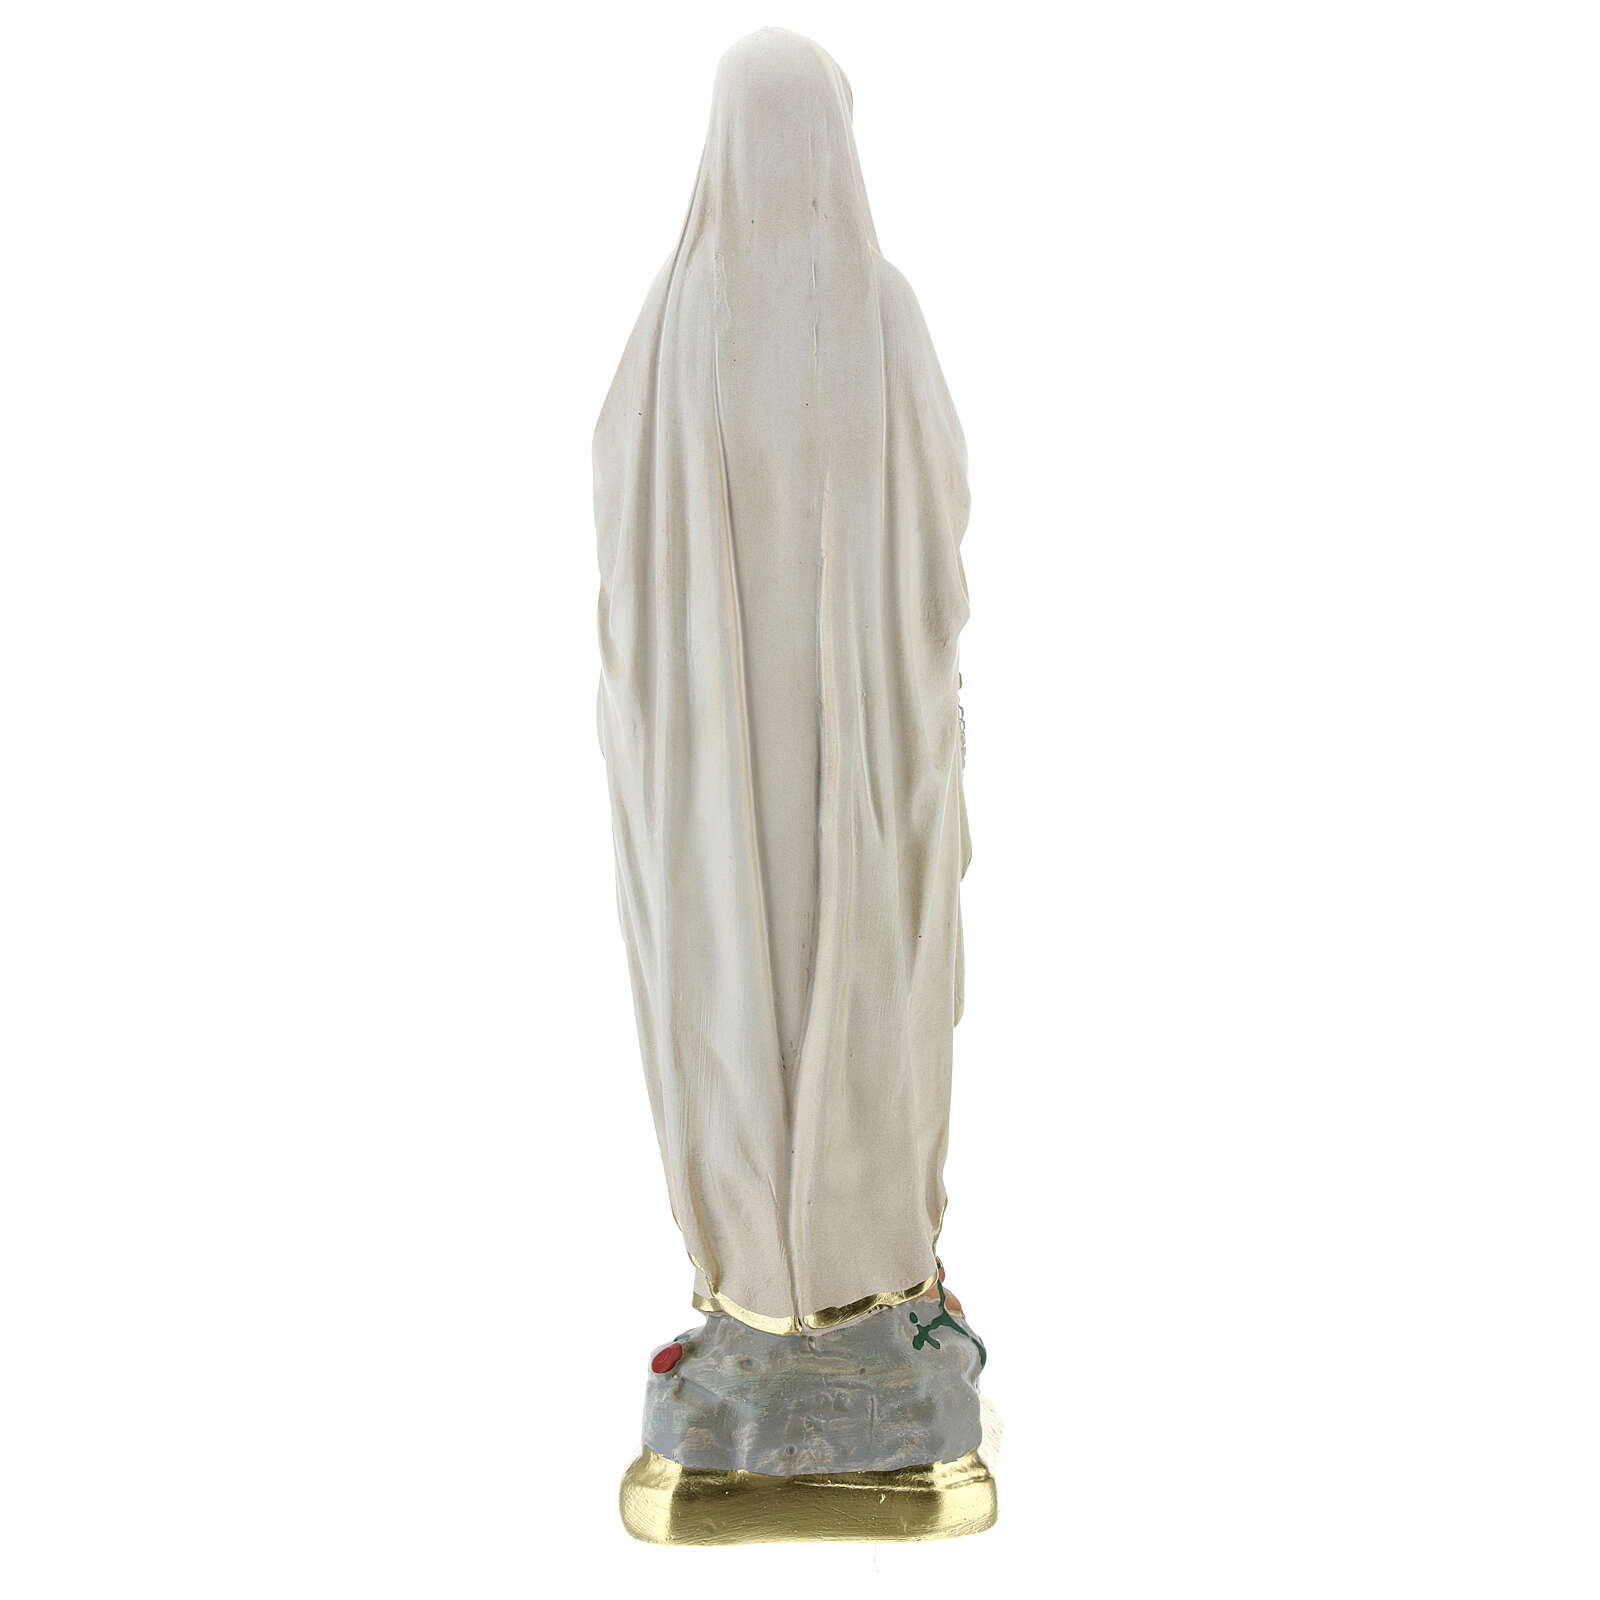 Madonna di Lourdes statua gesso 25 cm dipinta a mano Barsanti 4